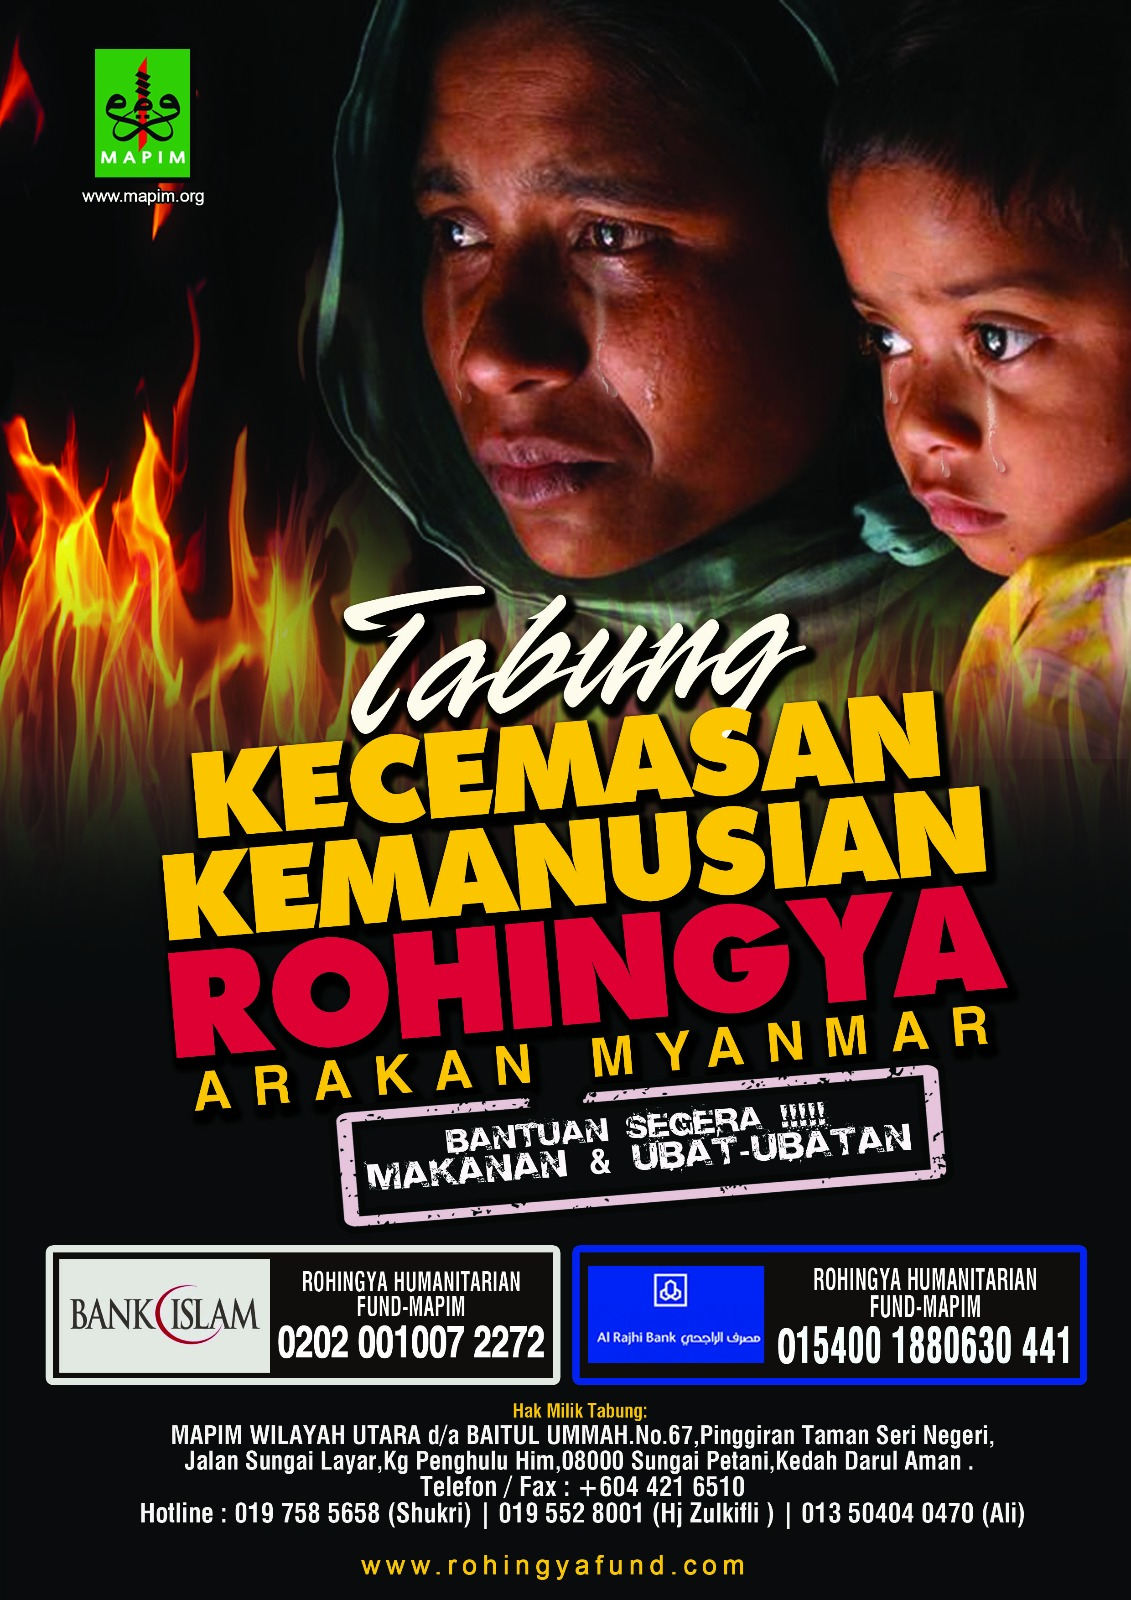 Tabung Rohingya